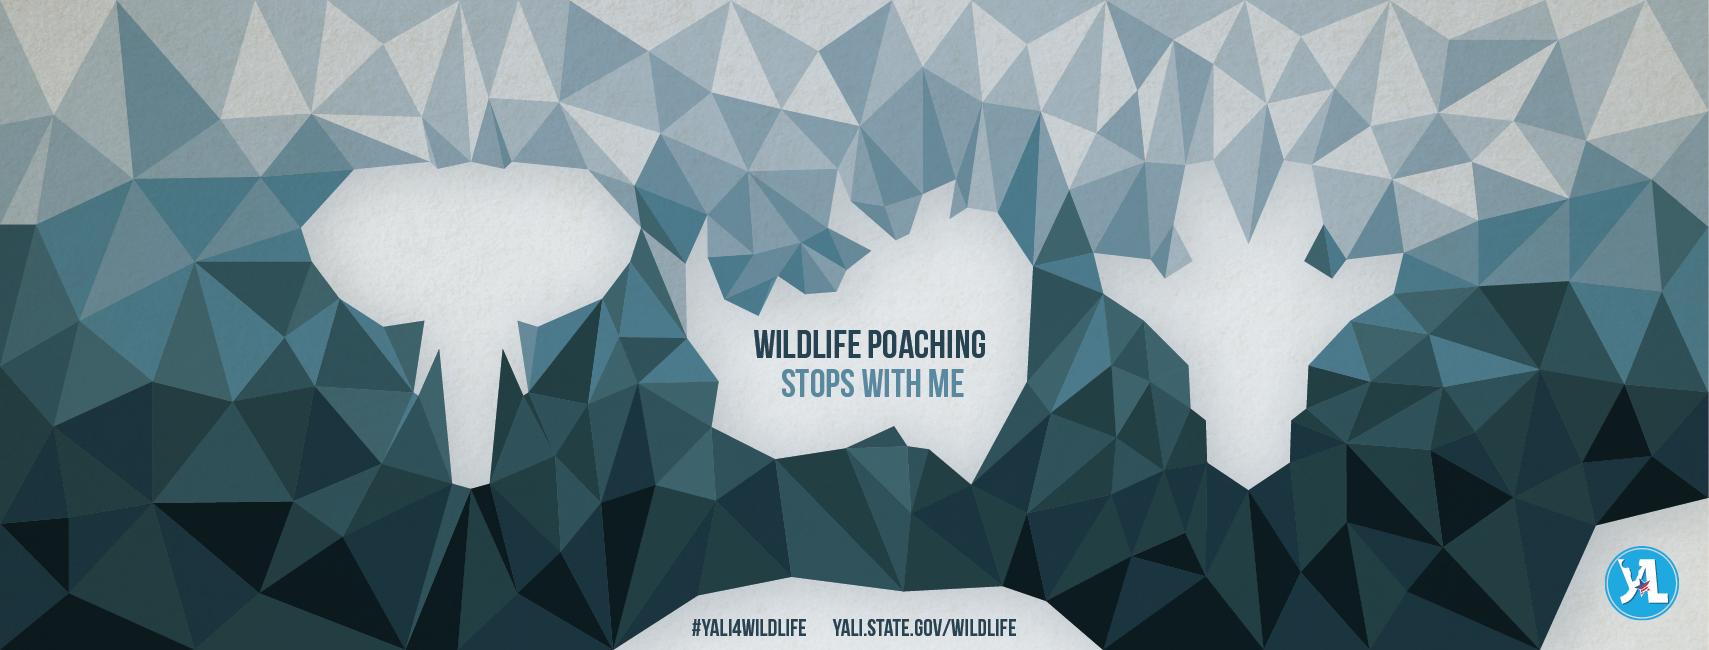 Wildlife Poaching Stops with me